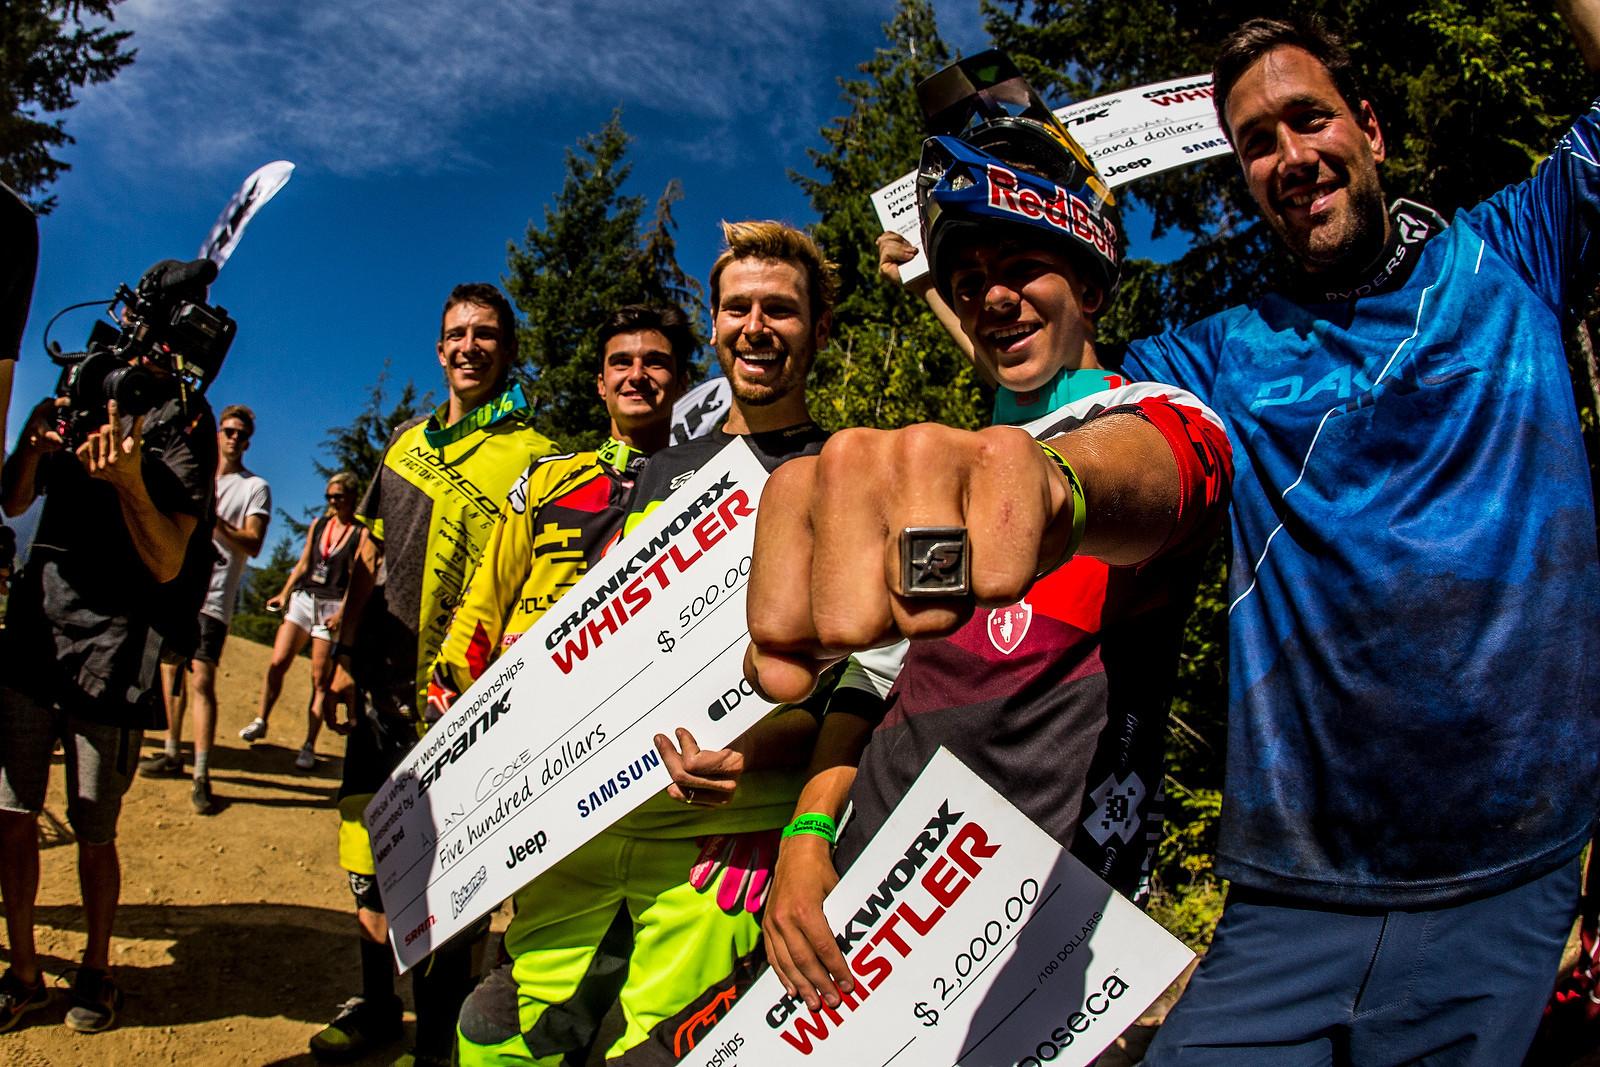 Whip Off Podium - Whip Off World Champs Photo Blast - Mountain Biking Pictures - Vital MTB